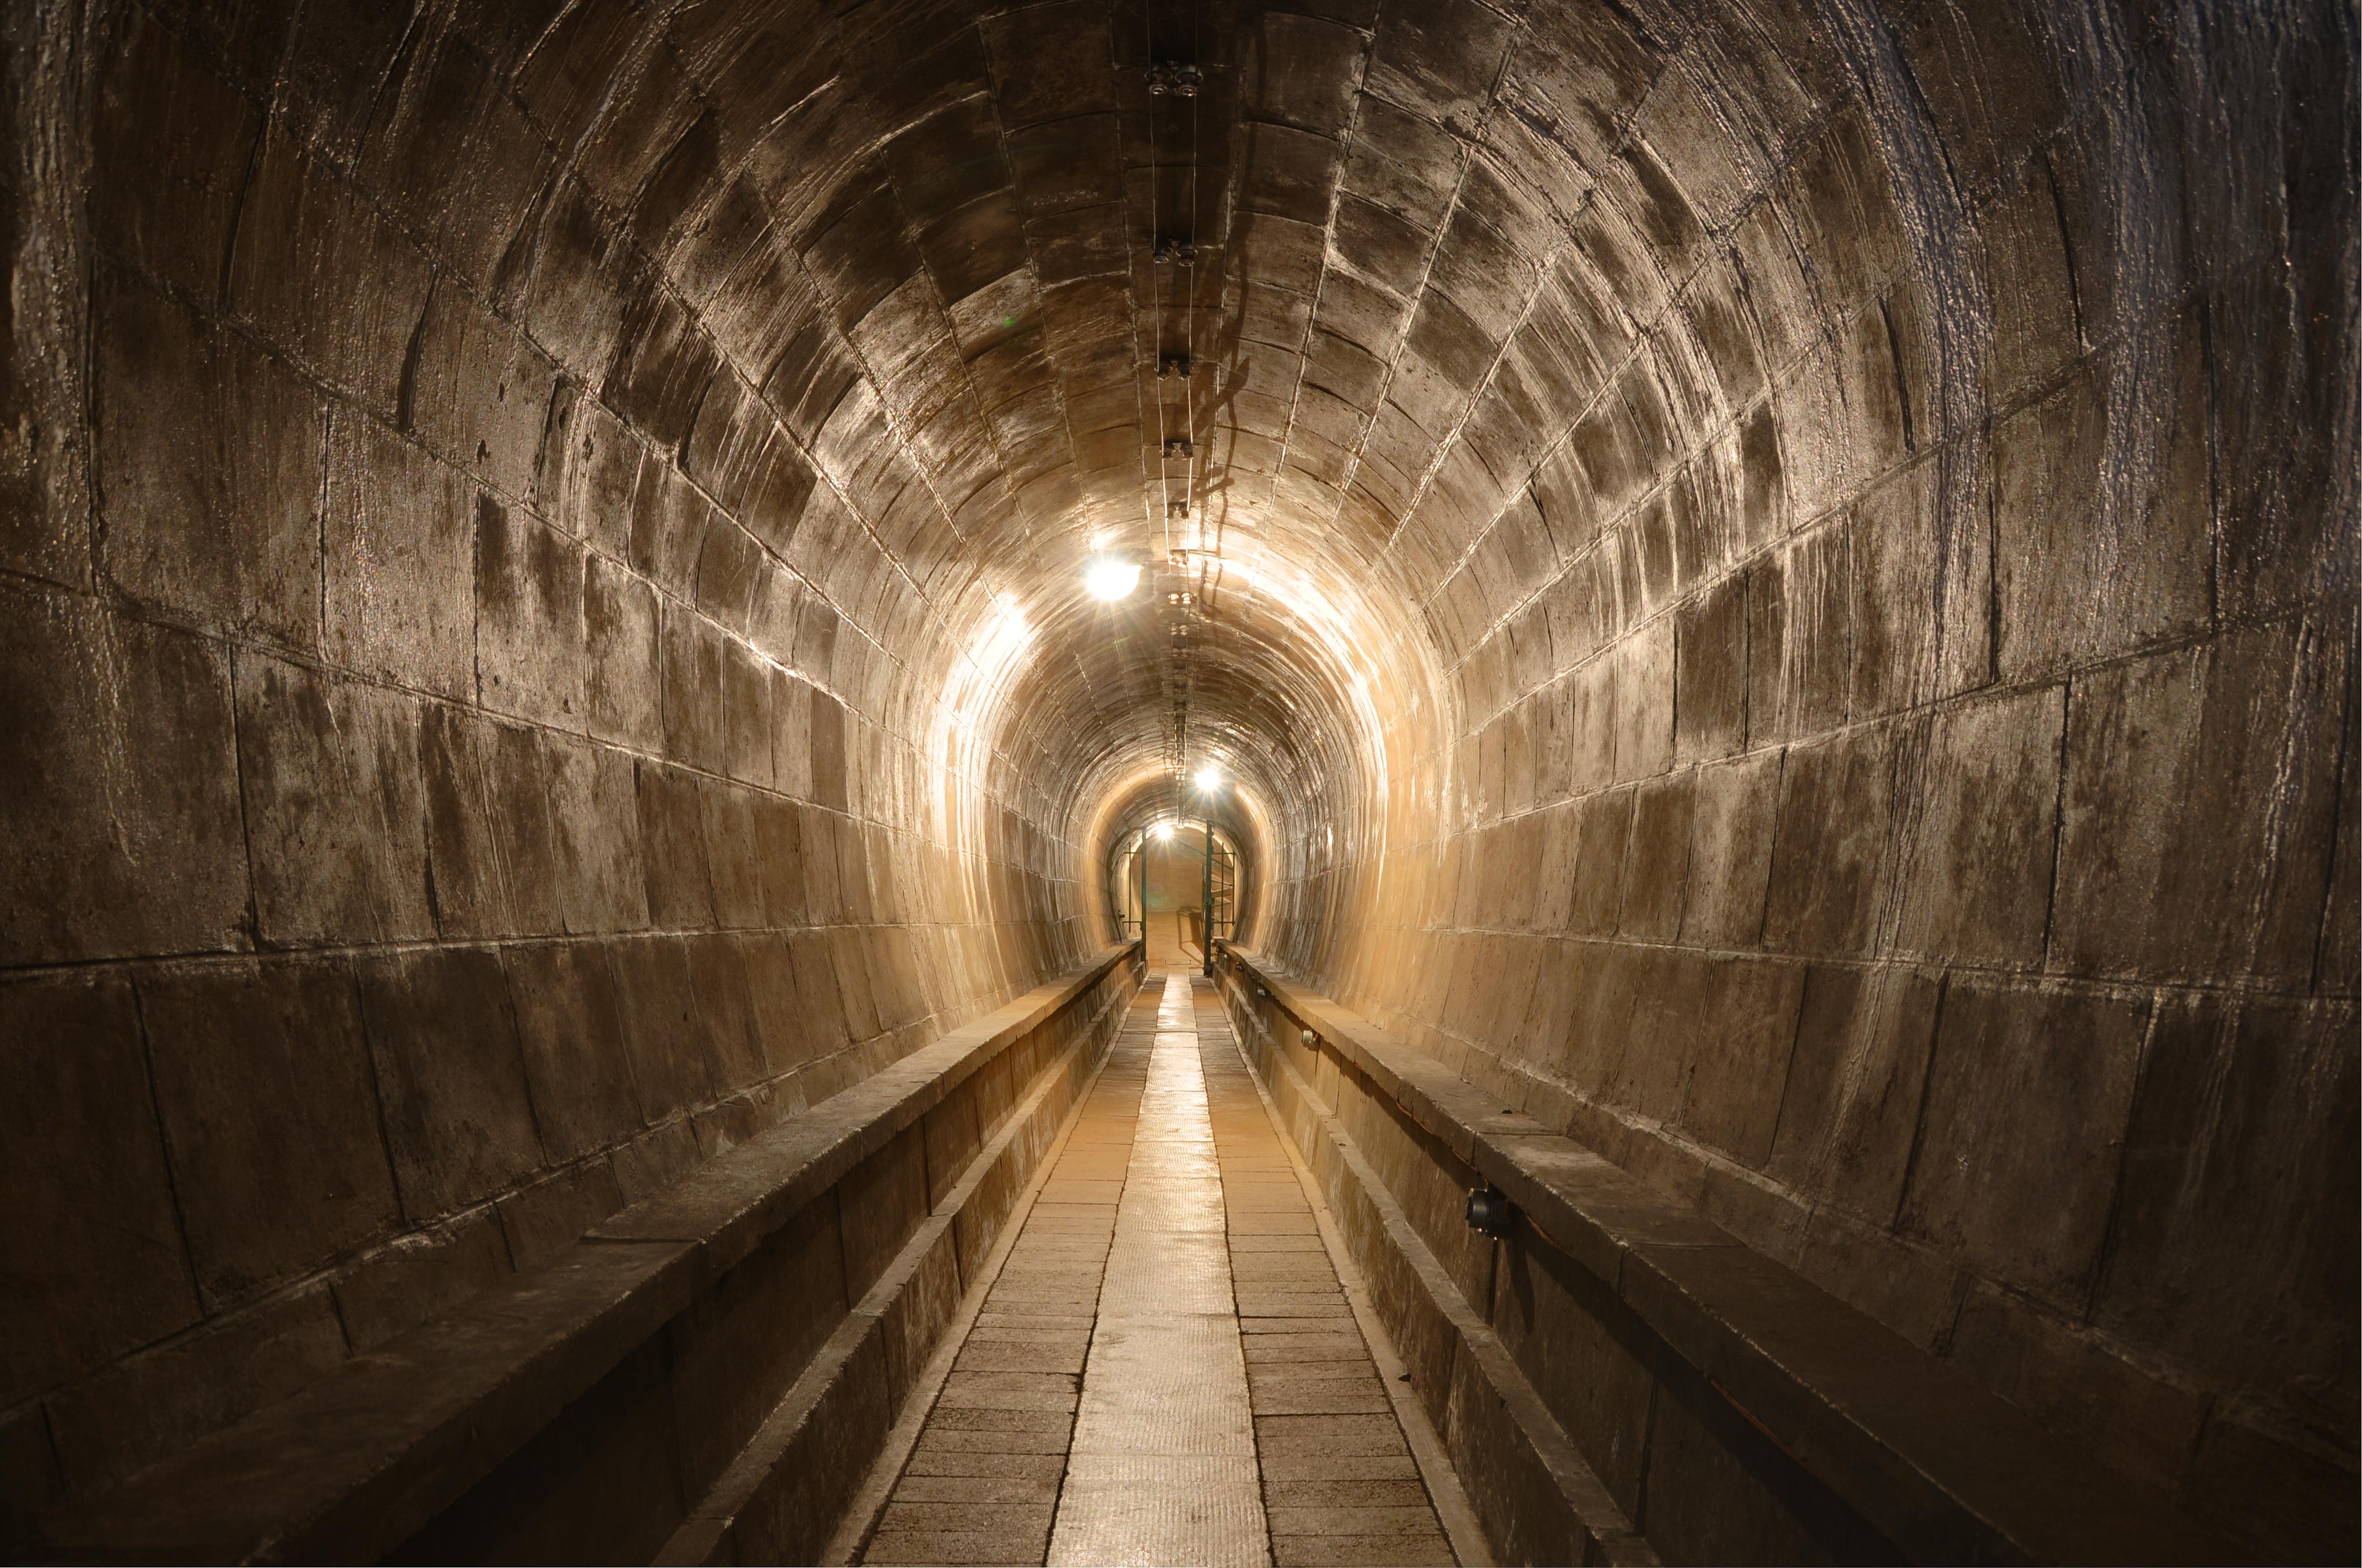 hetunnelsofortdeutzig,ermanfortificationsbuiltin1893.ythe19thcentury,tunnelswereusedtoconnectblockhousesandfiringpointsintheditchtothefort.